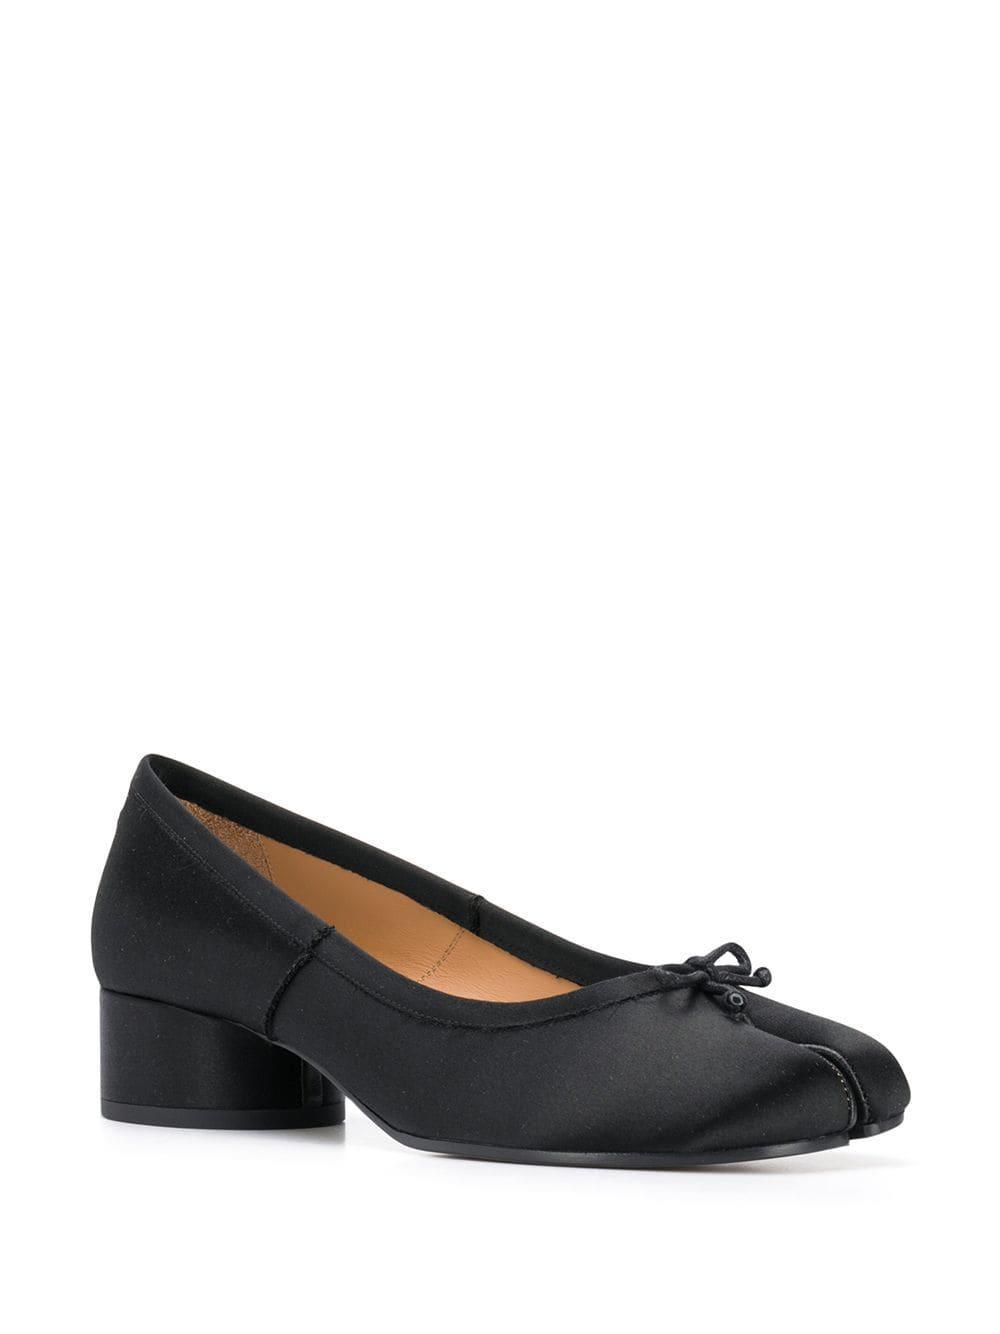 fd0b071d9ea9 Lyst - Maison Margiela Tabi Toe Ballerina Pumps in Black